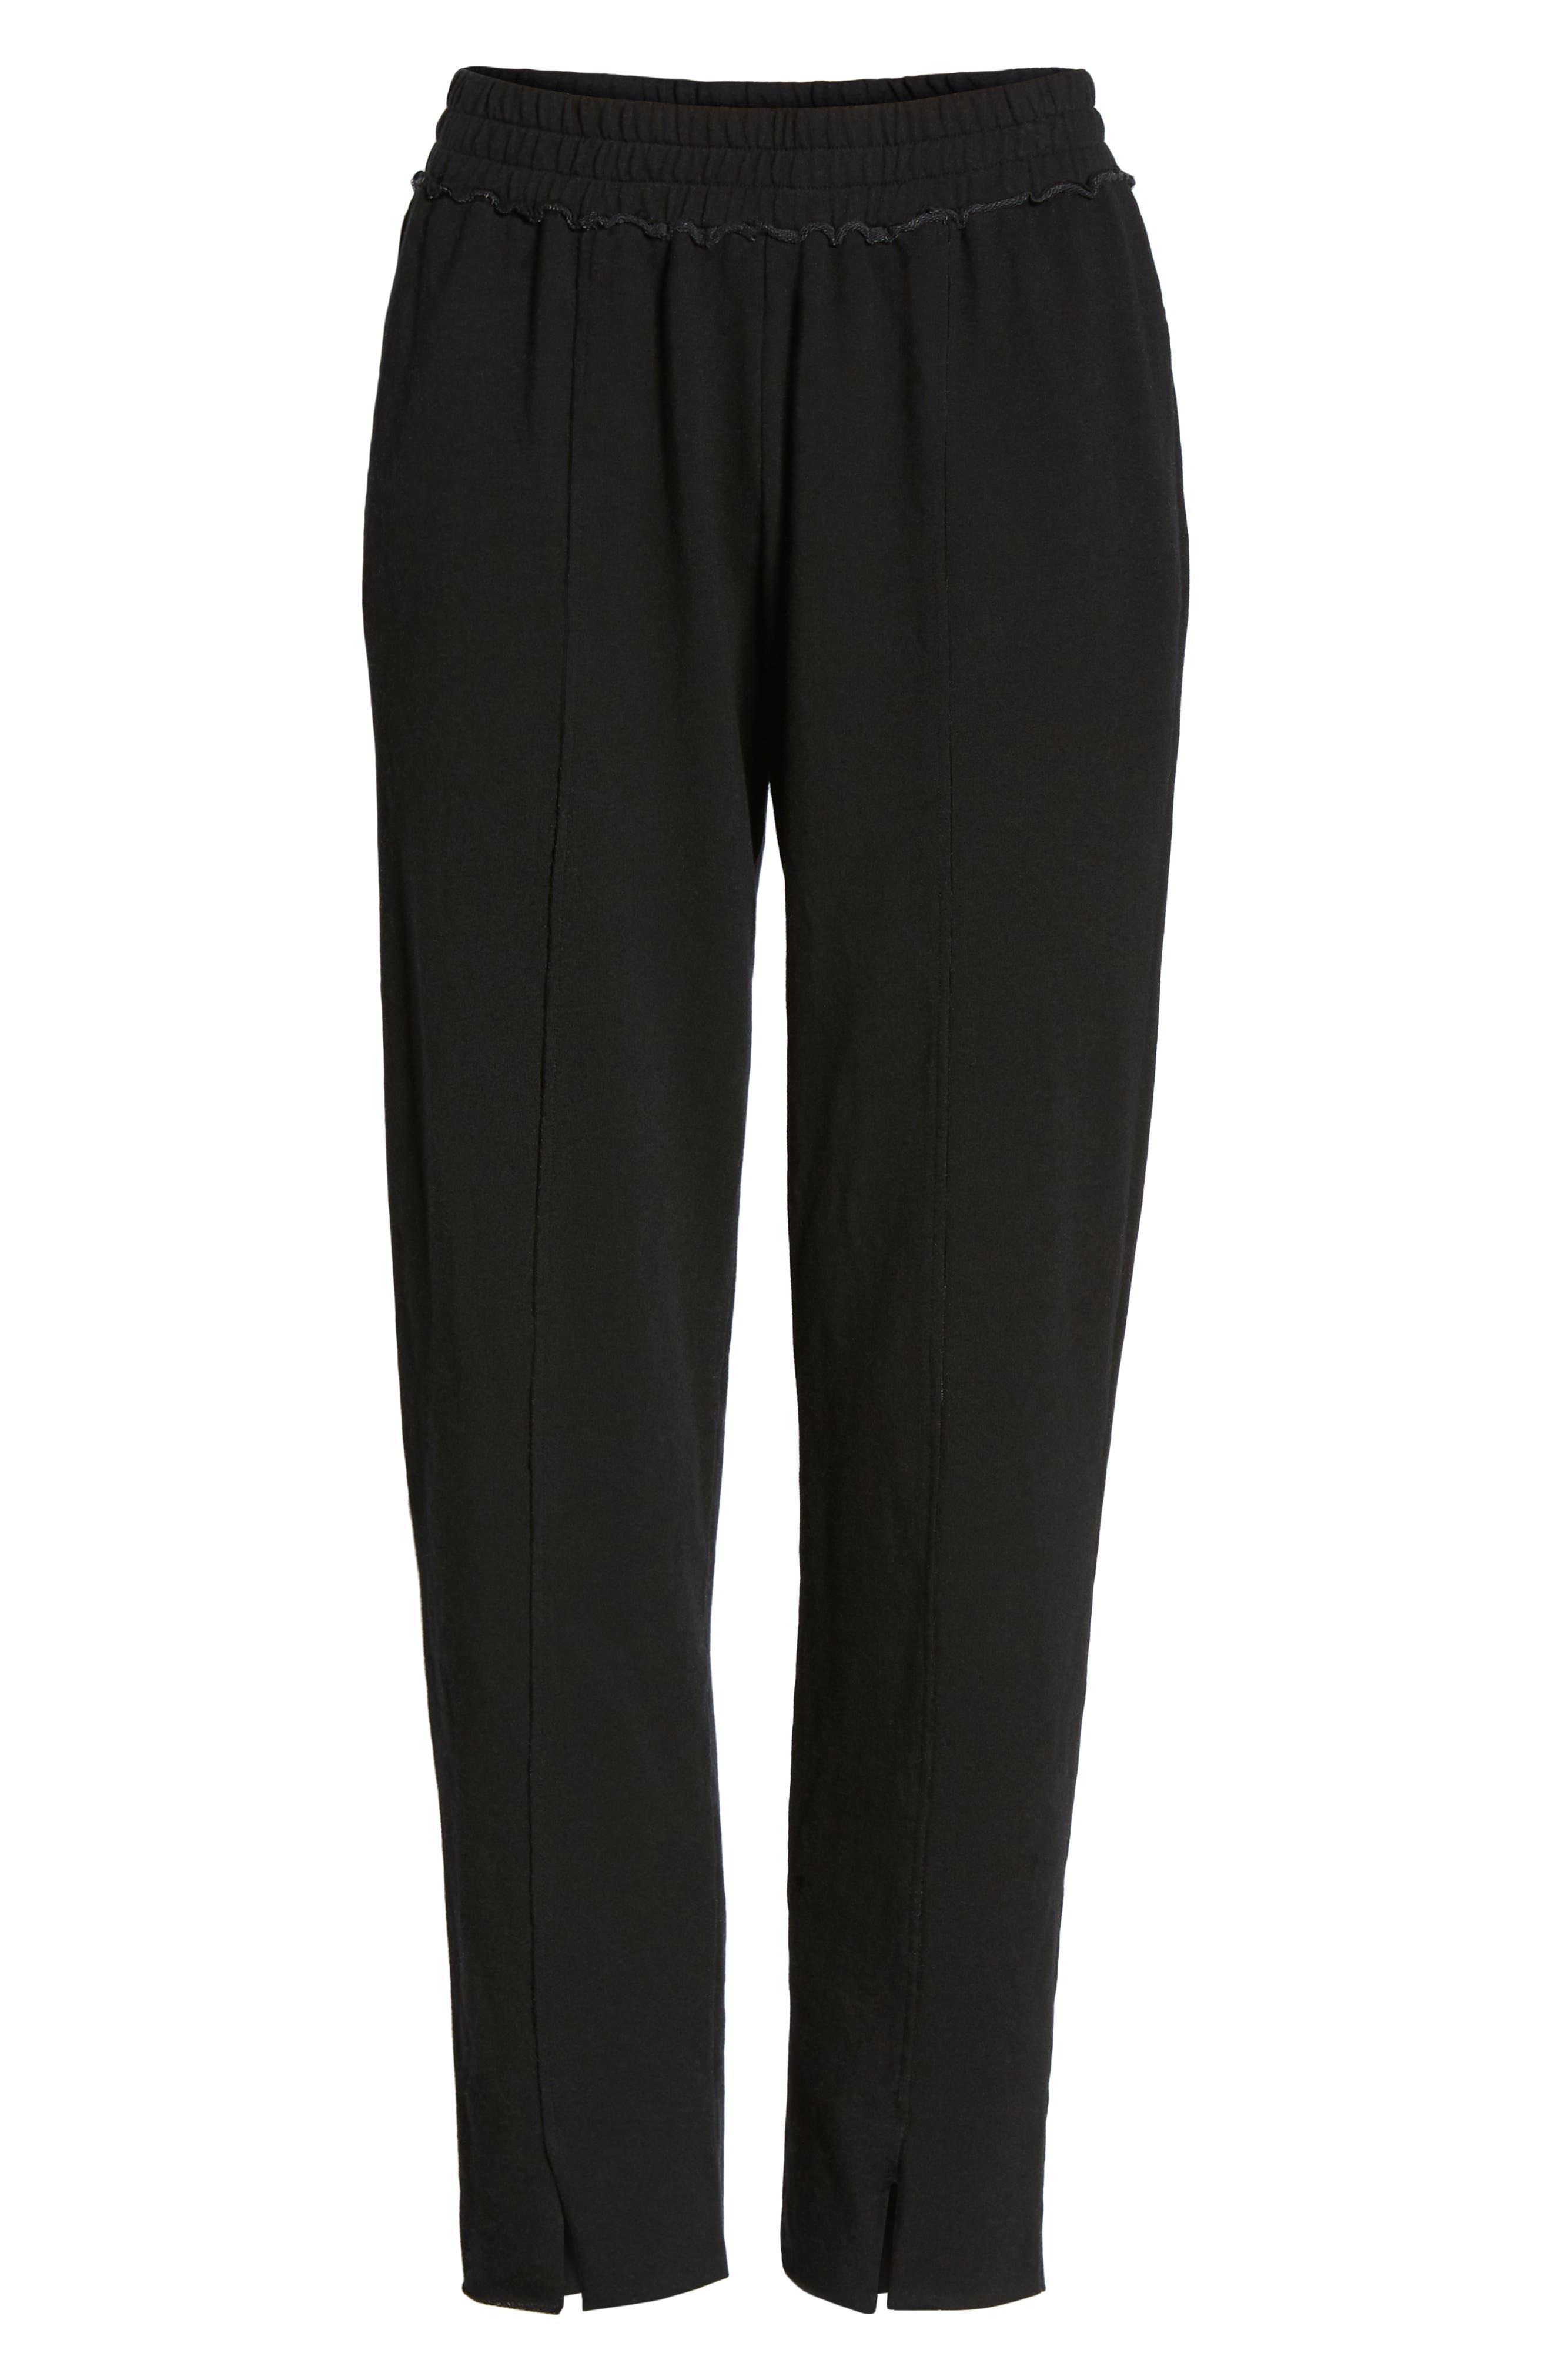 Lowsen Split Hem Sweatpants,                             Alternate thumbnail 7, color,                             Black